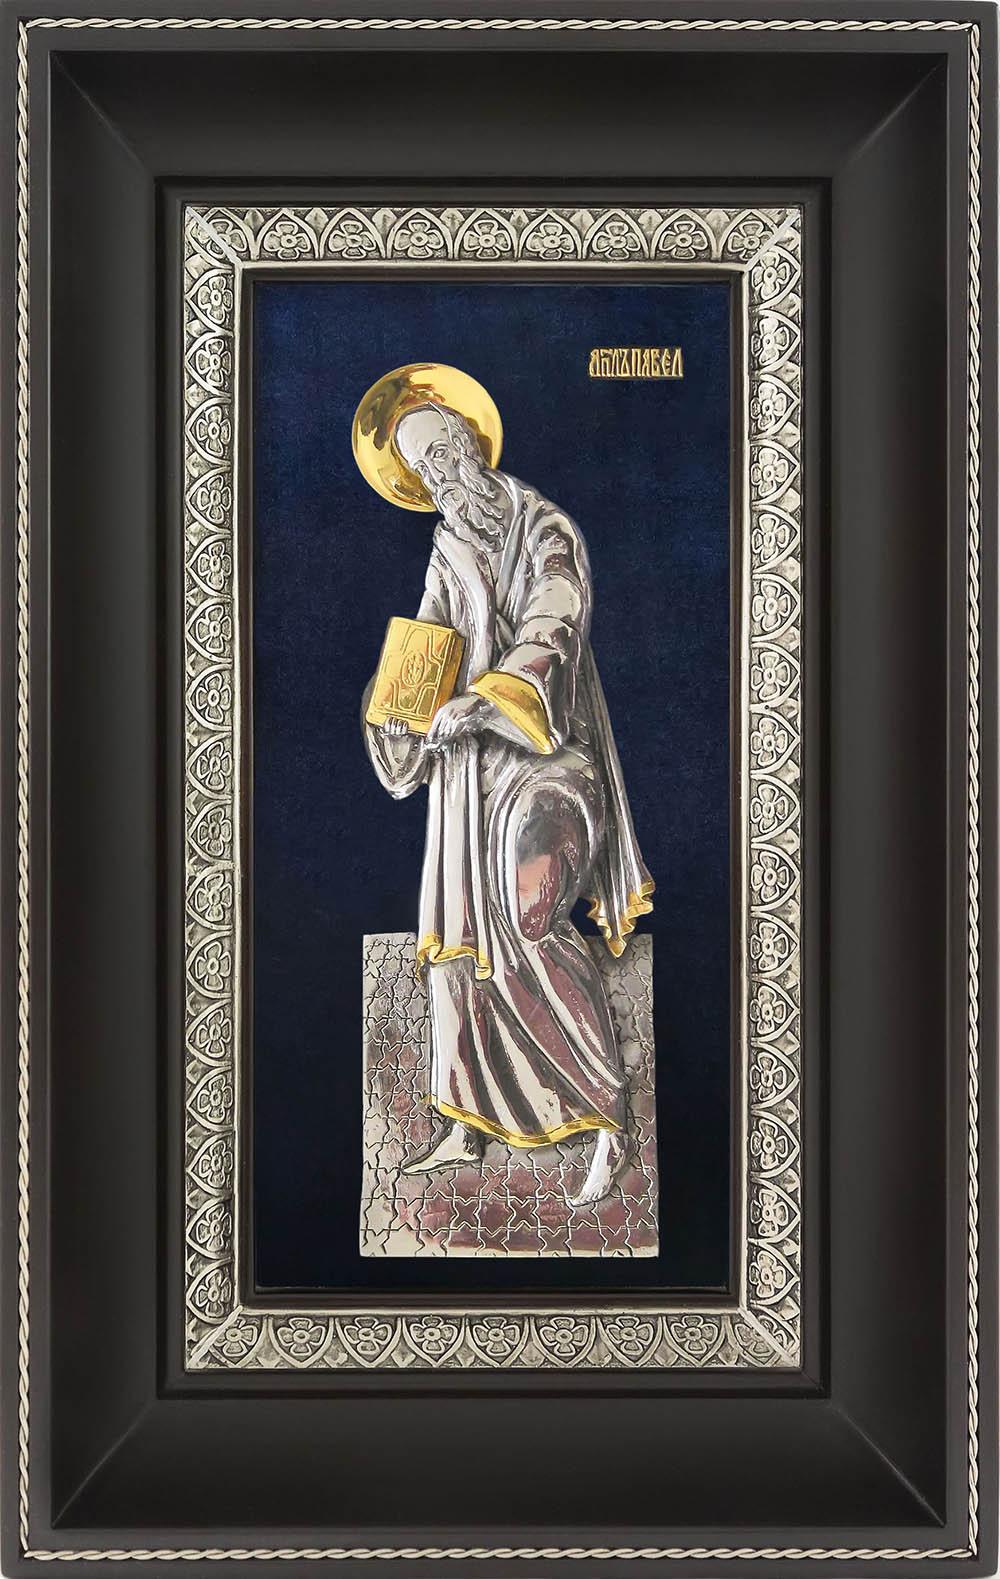 фото икона святого апостола Павла гальванопластика золото серебро